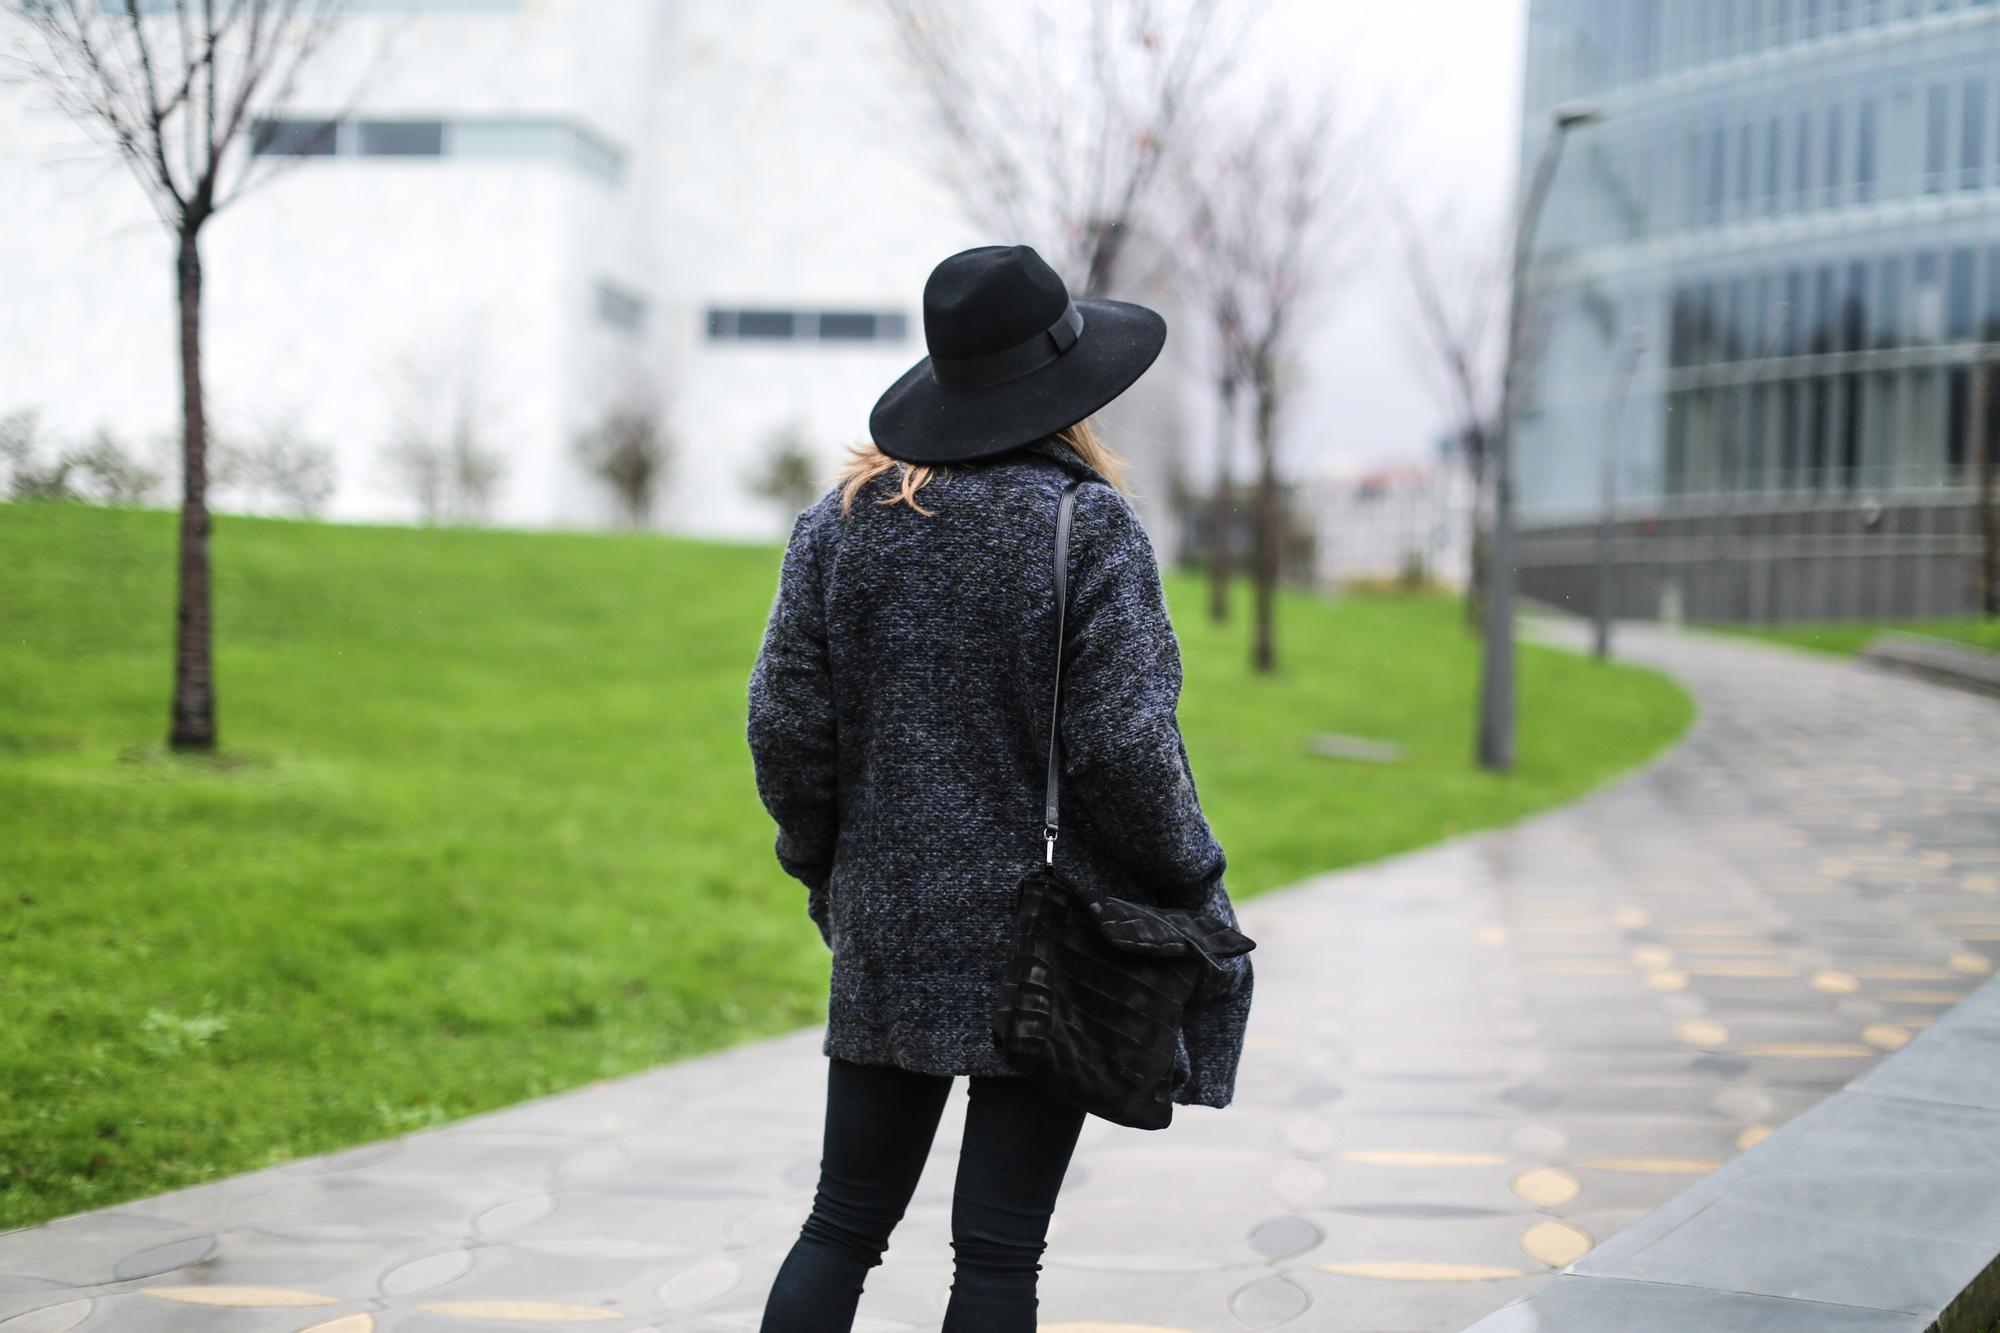 Clochet-streetstyle-mango-jacket-fedora-hat-kitten-heels-5